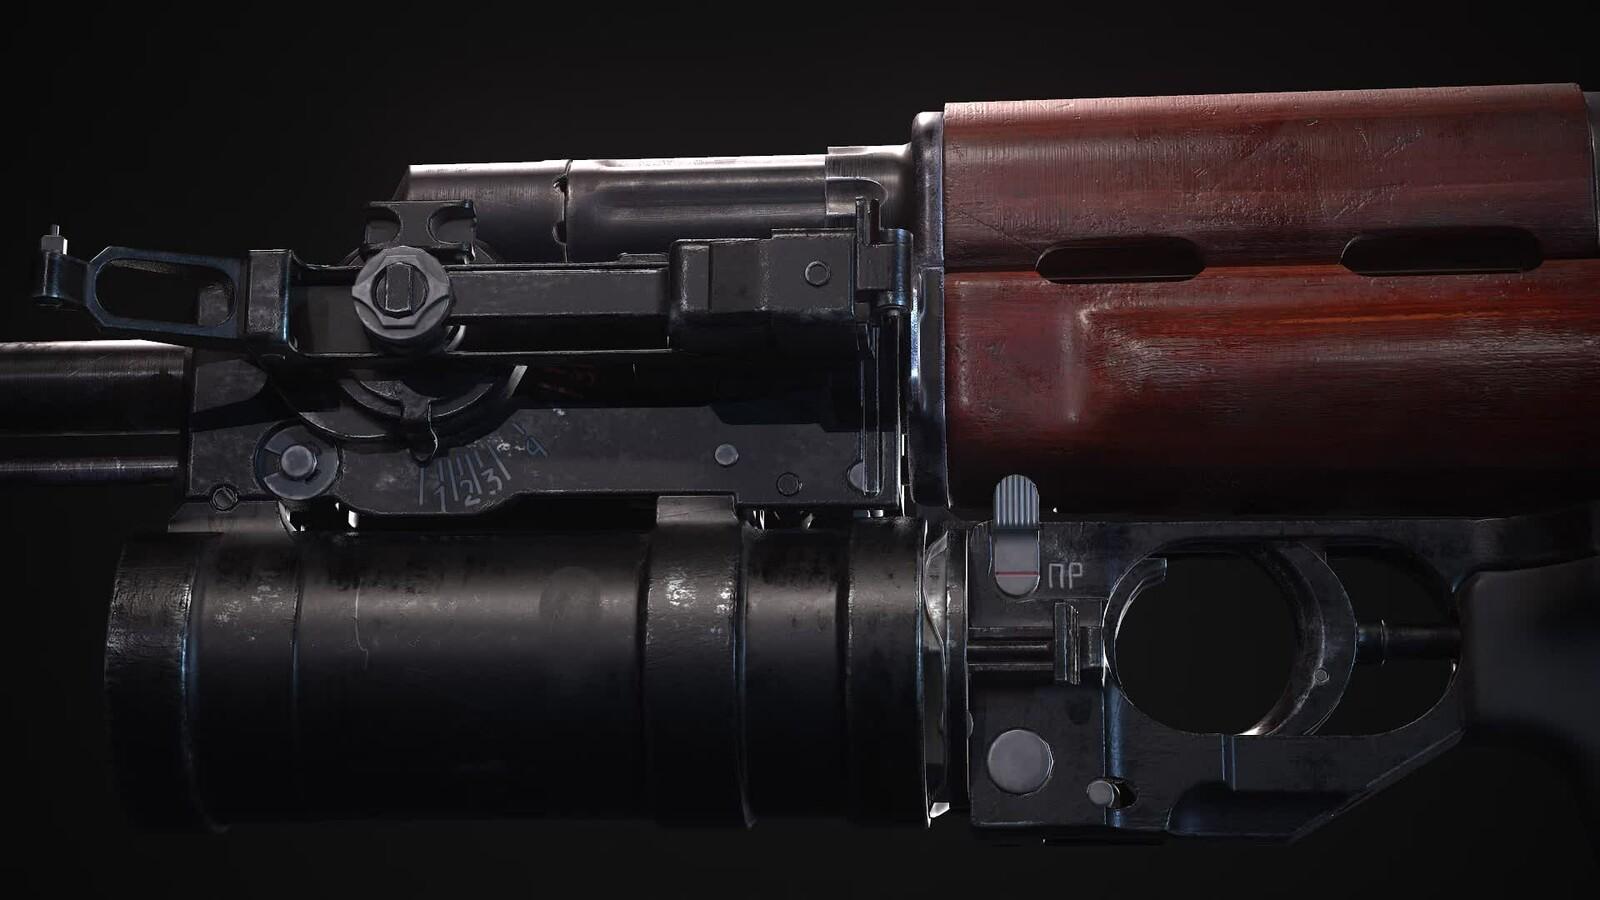 Kalashnikov AKM with GP-25 40mm launcher and all internals